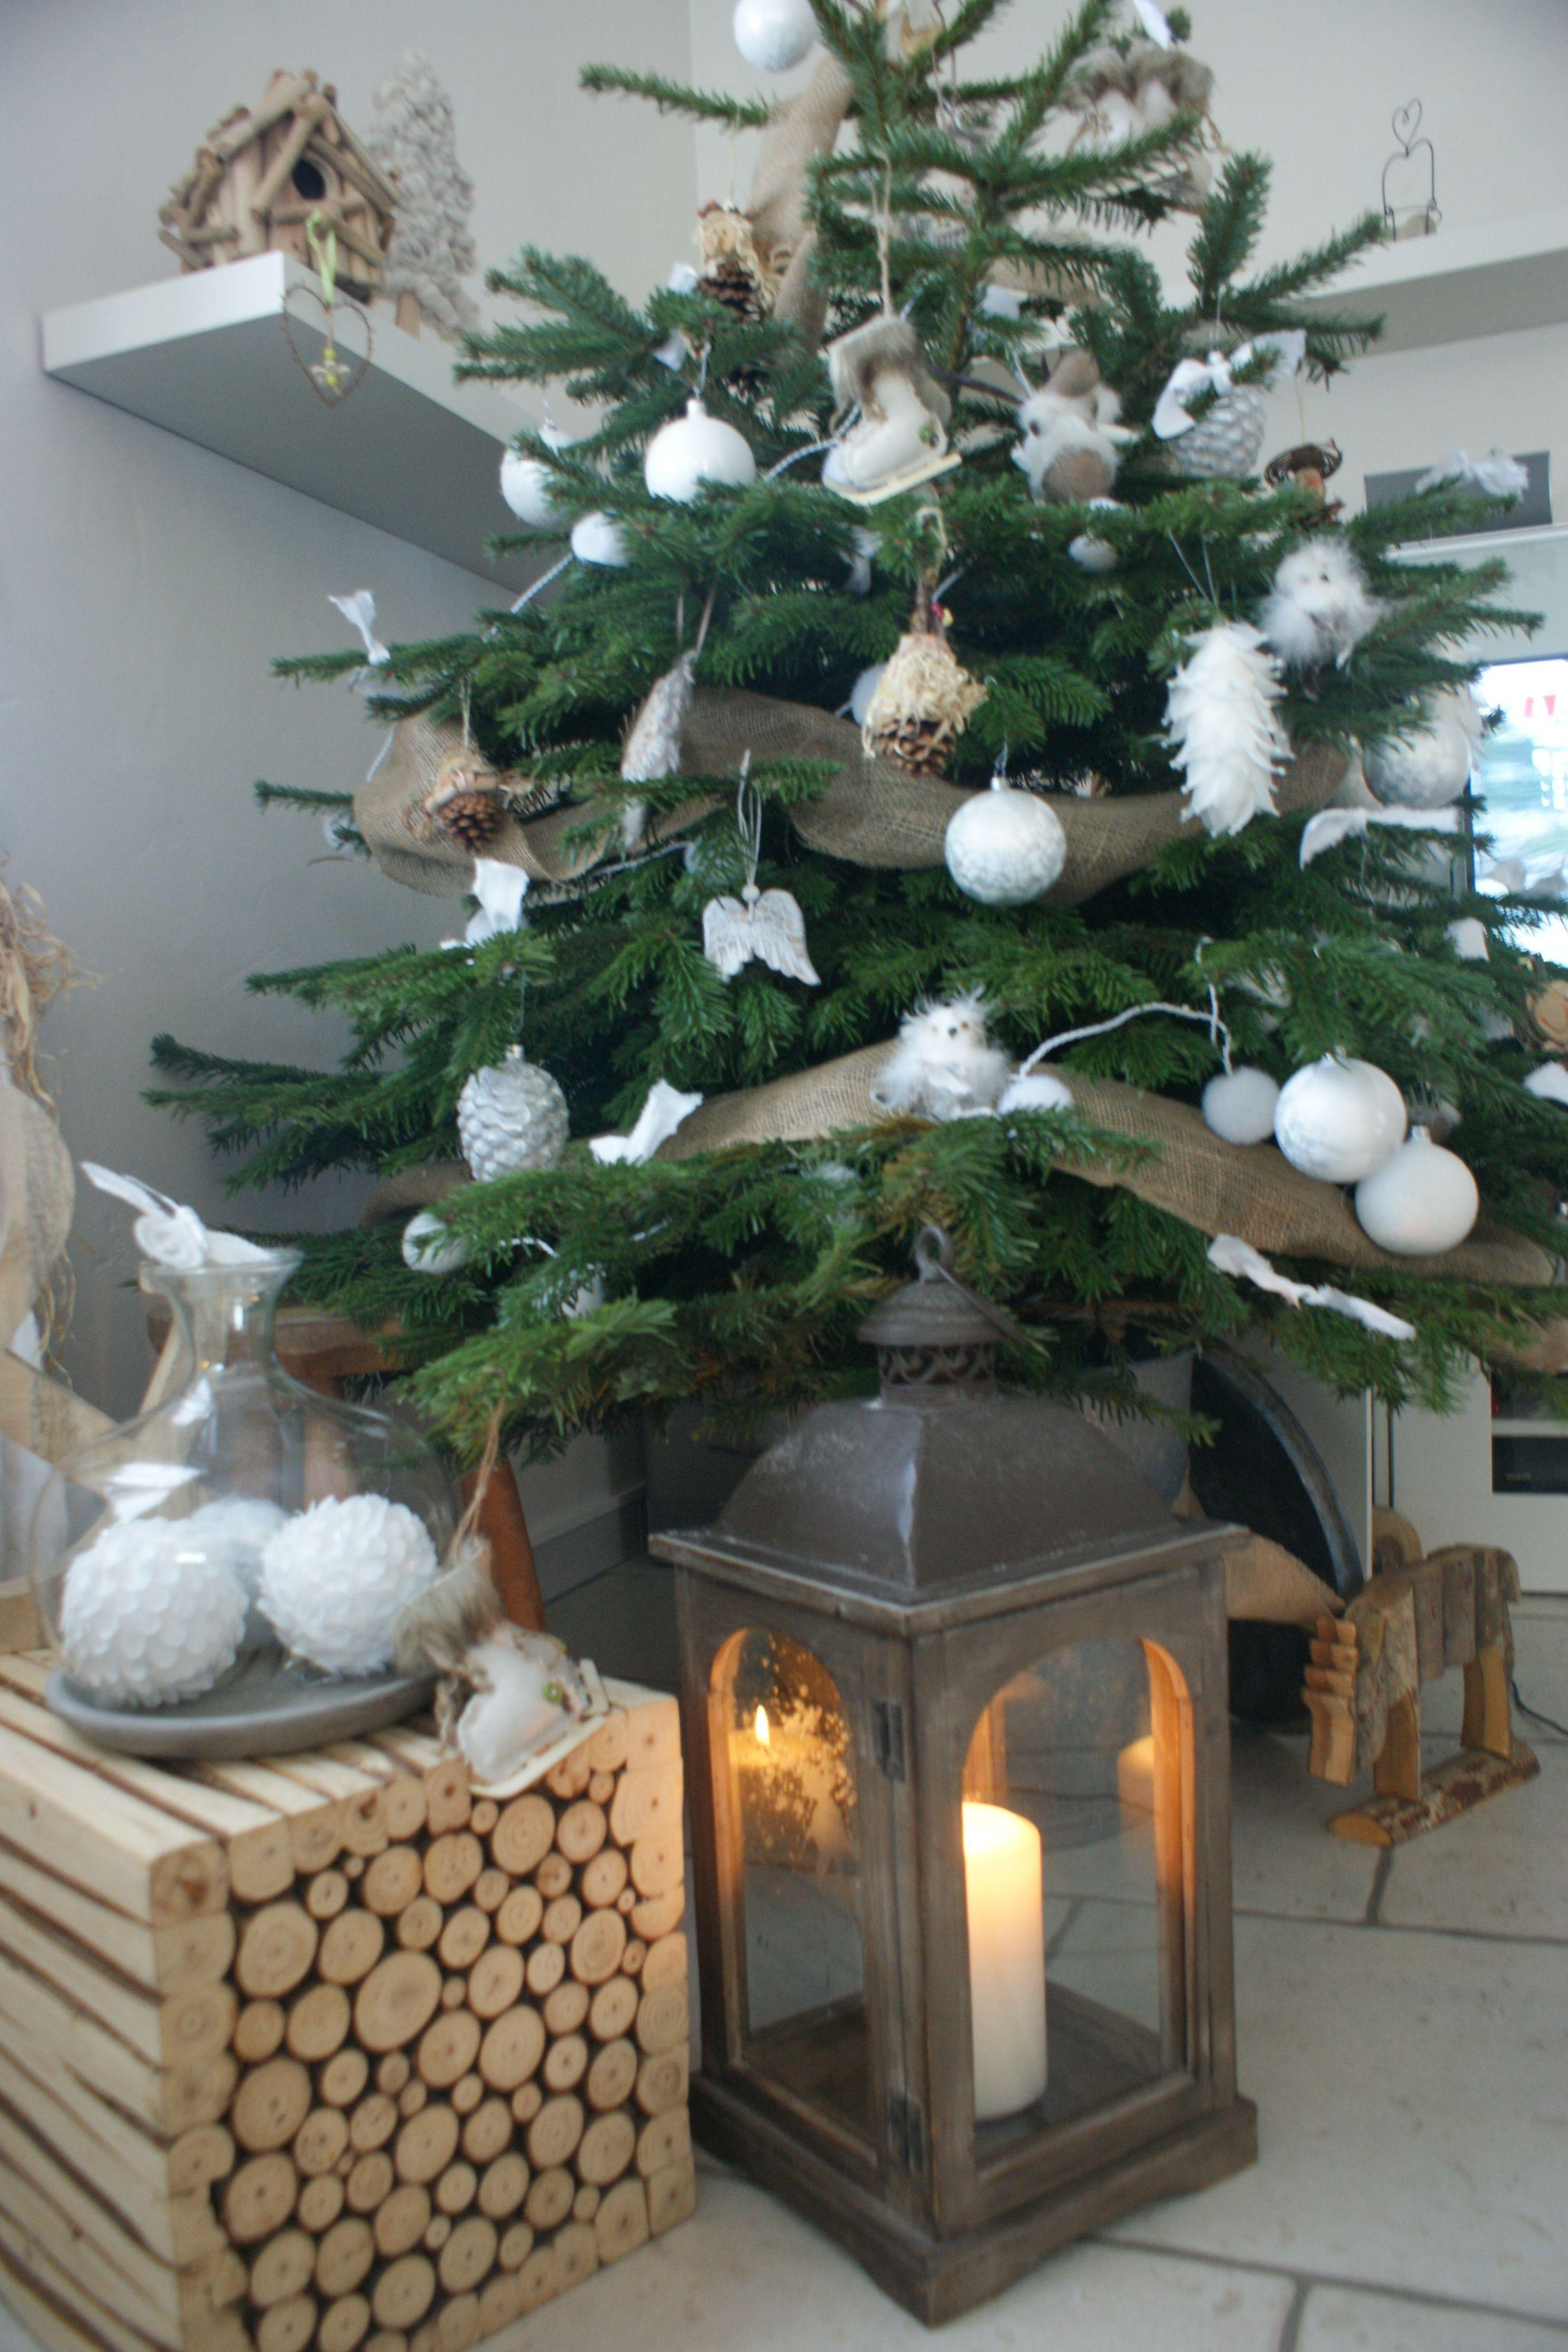 mon joli sapin de noel blanc et naturel chrismas tree. Black Bedroom Furniture Sets. Home Design Ideas